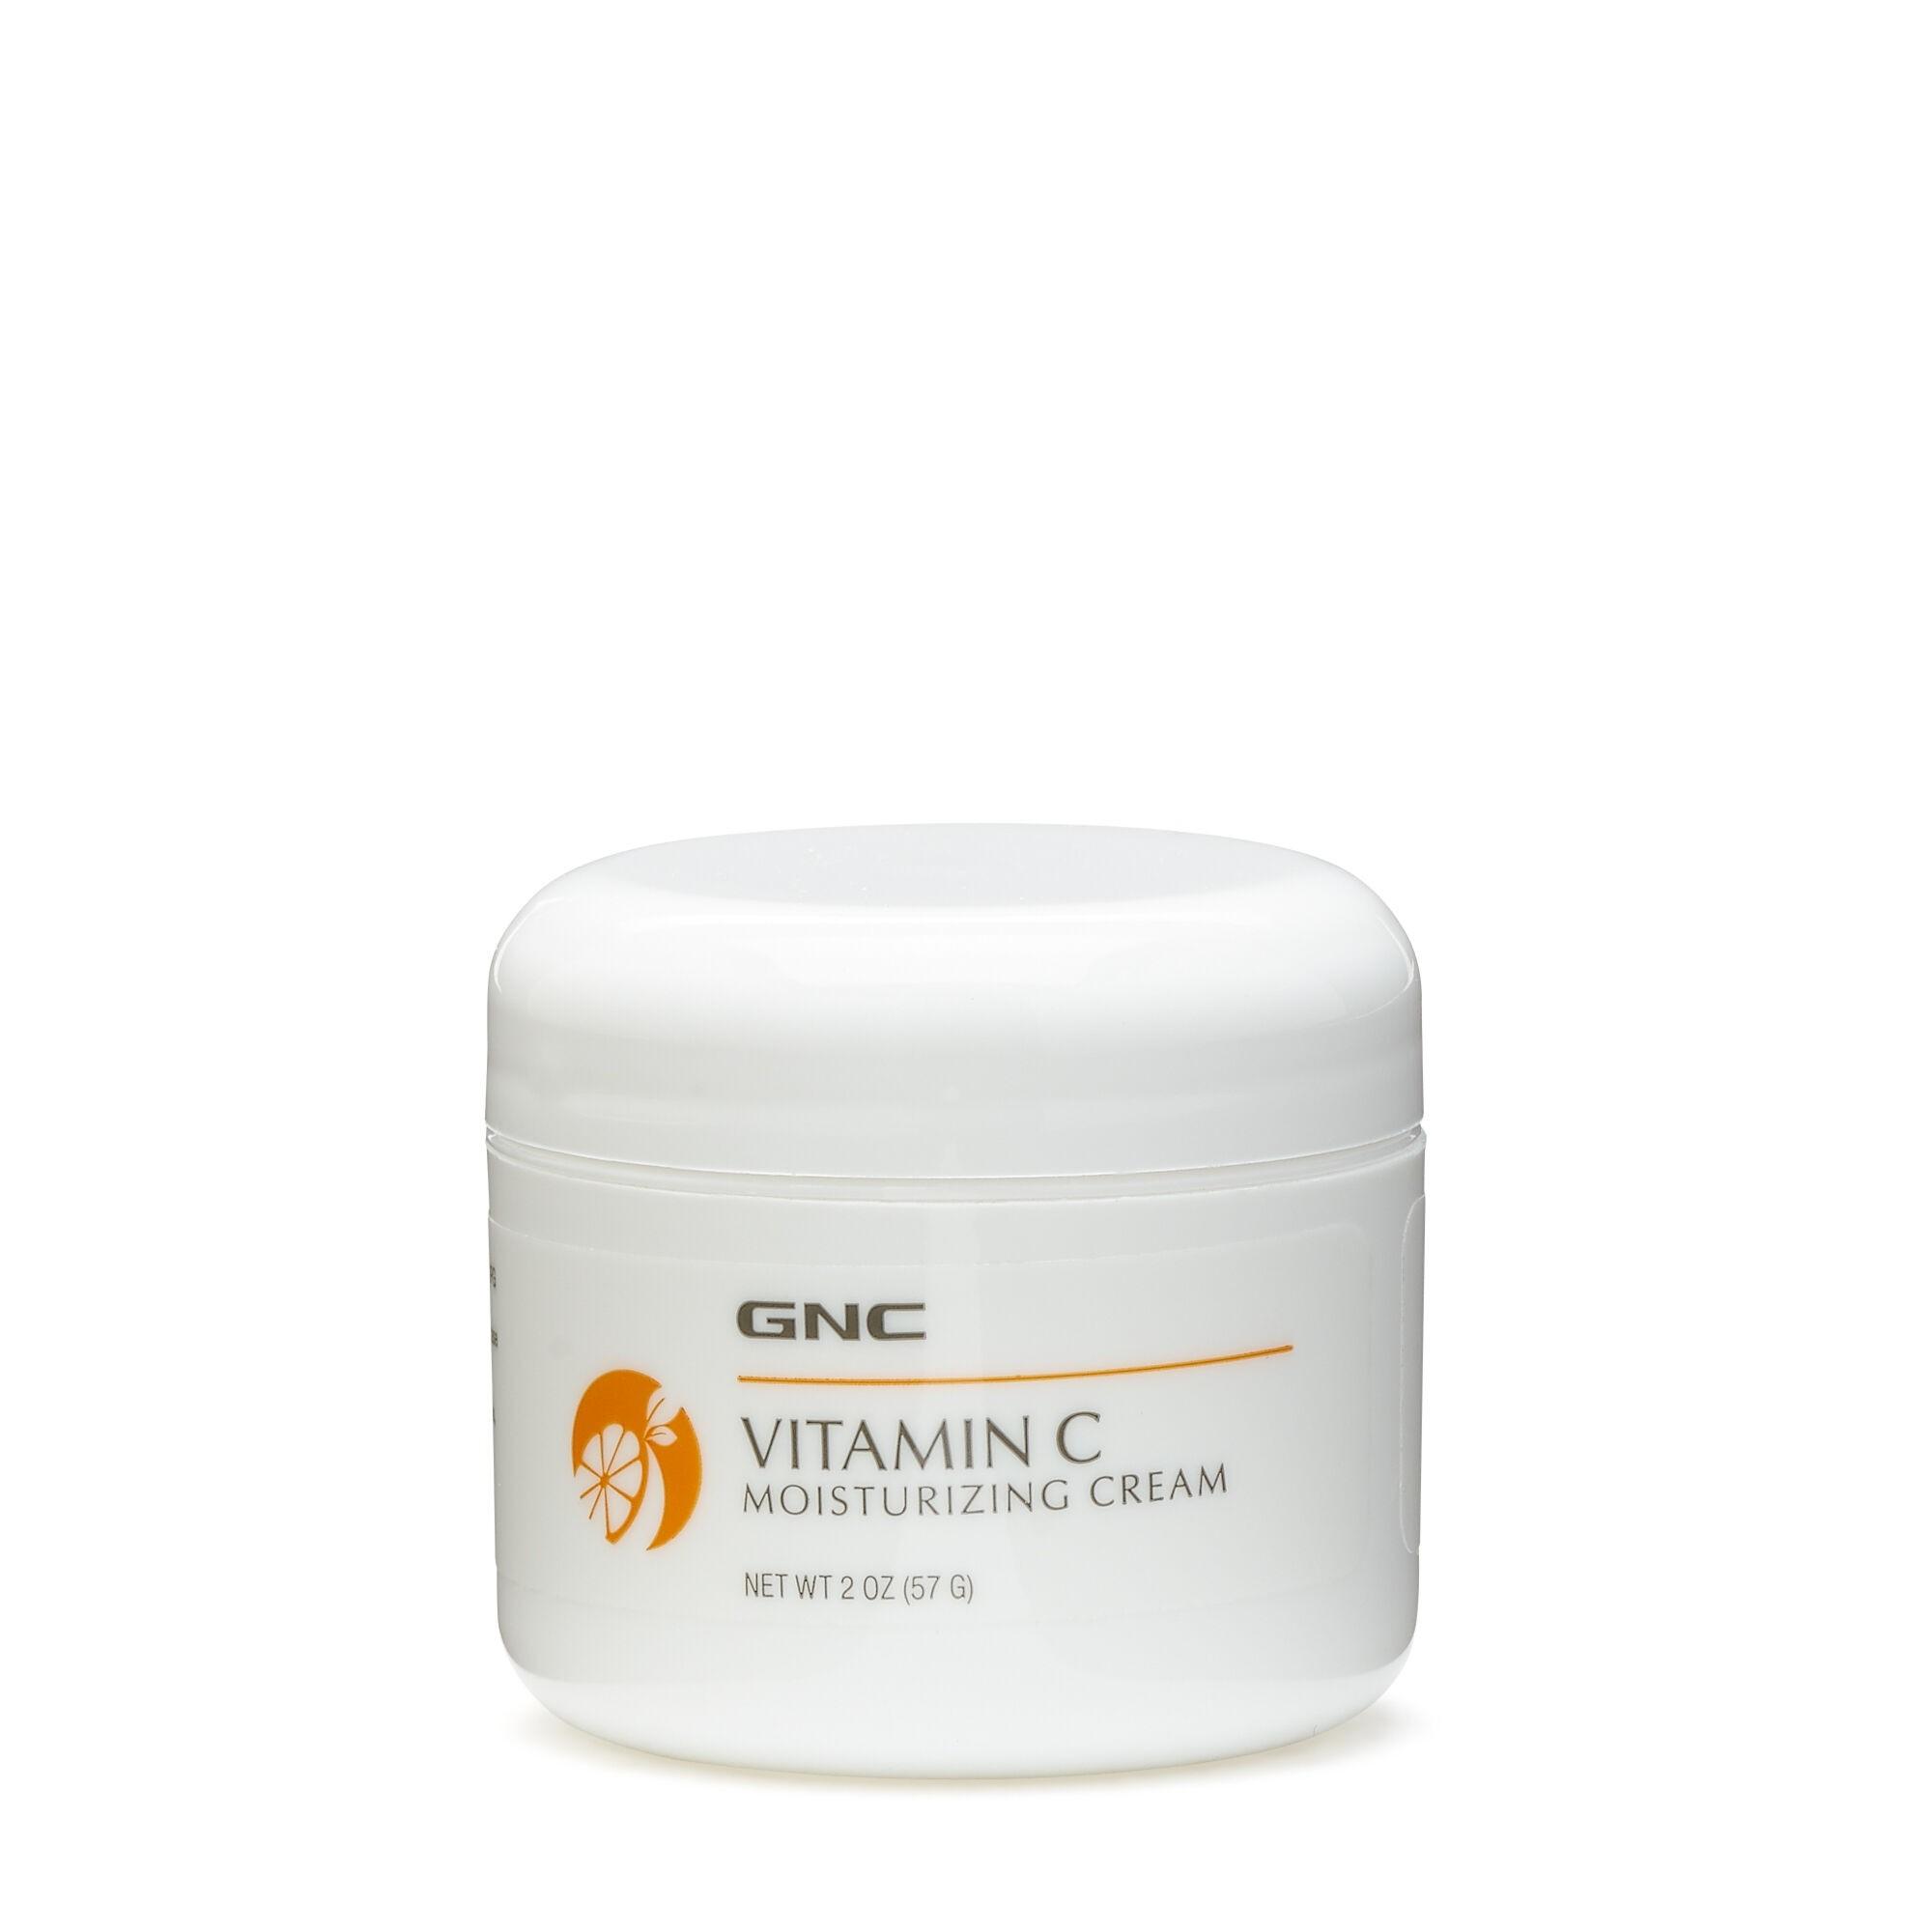 GNC Crema hidratanta, Moisturizing Cream Vitamin C, 57 g